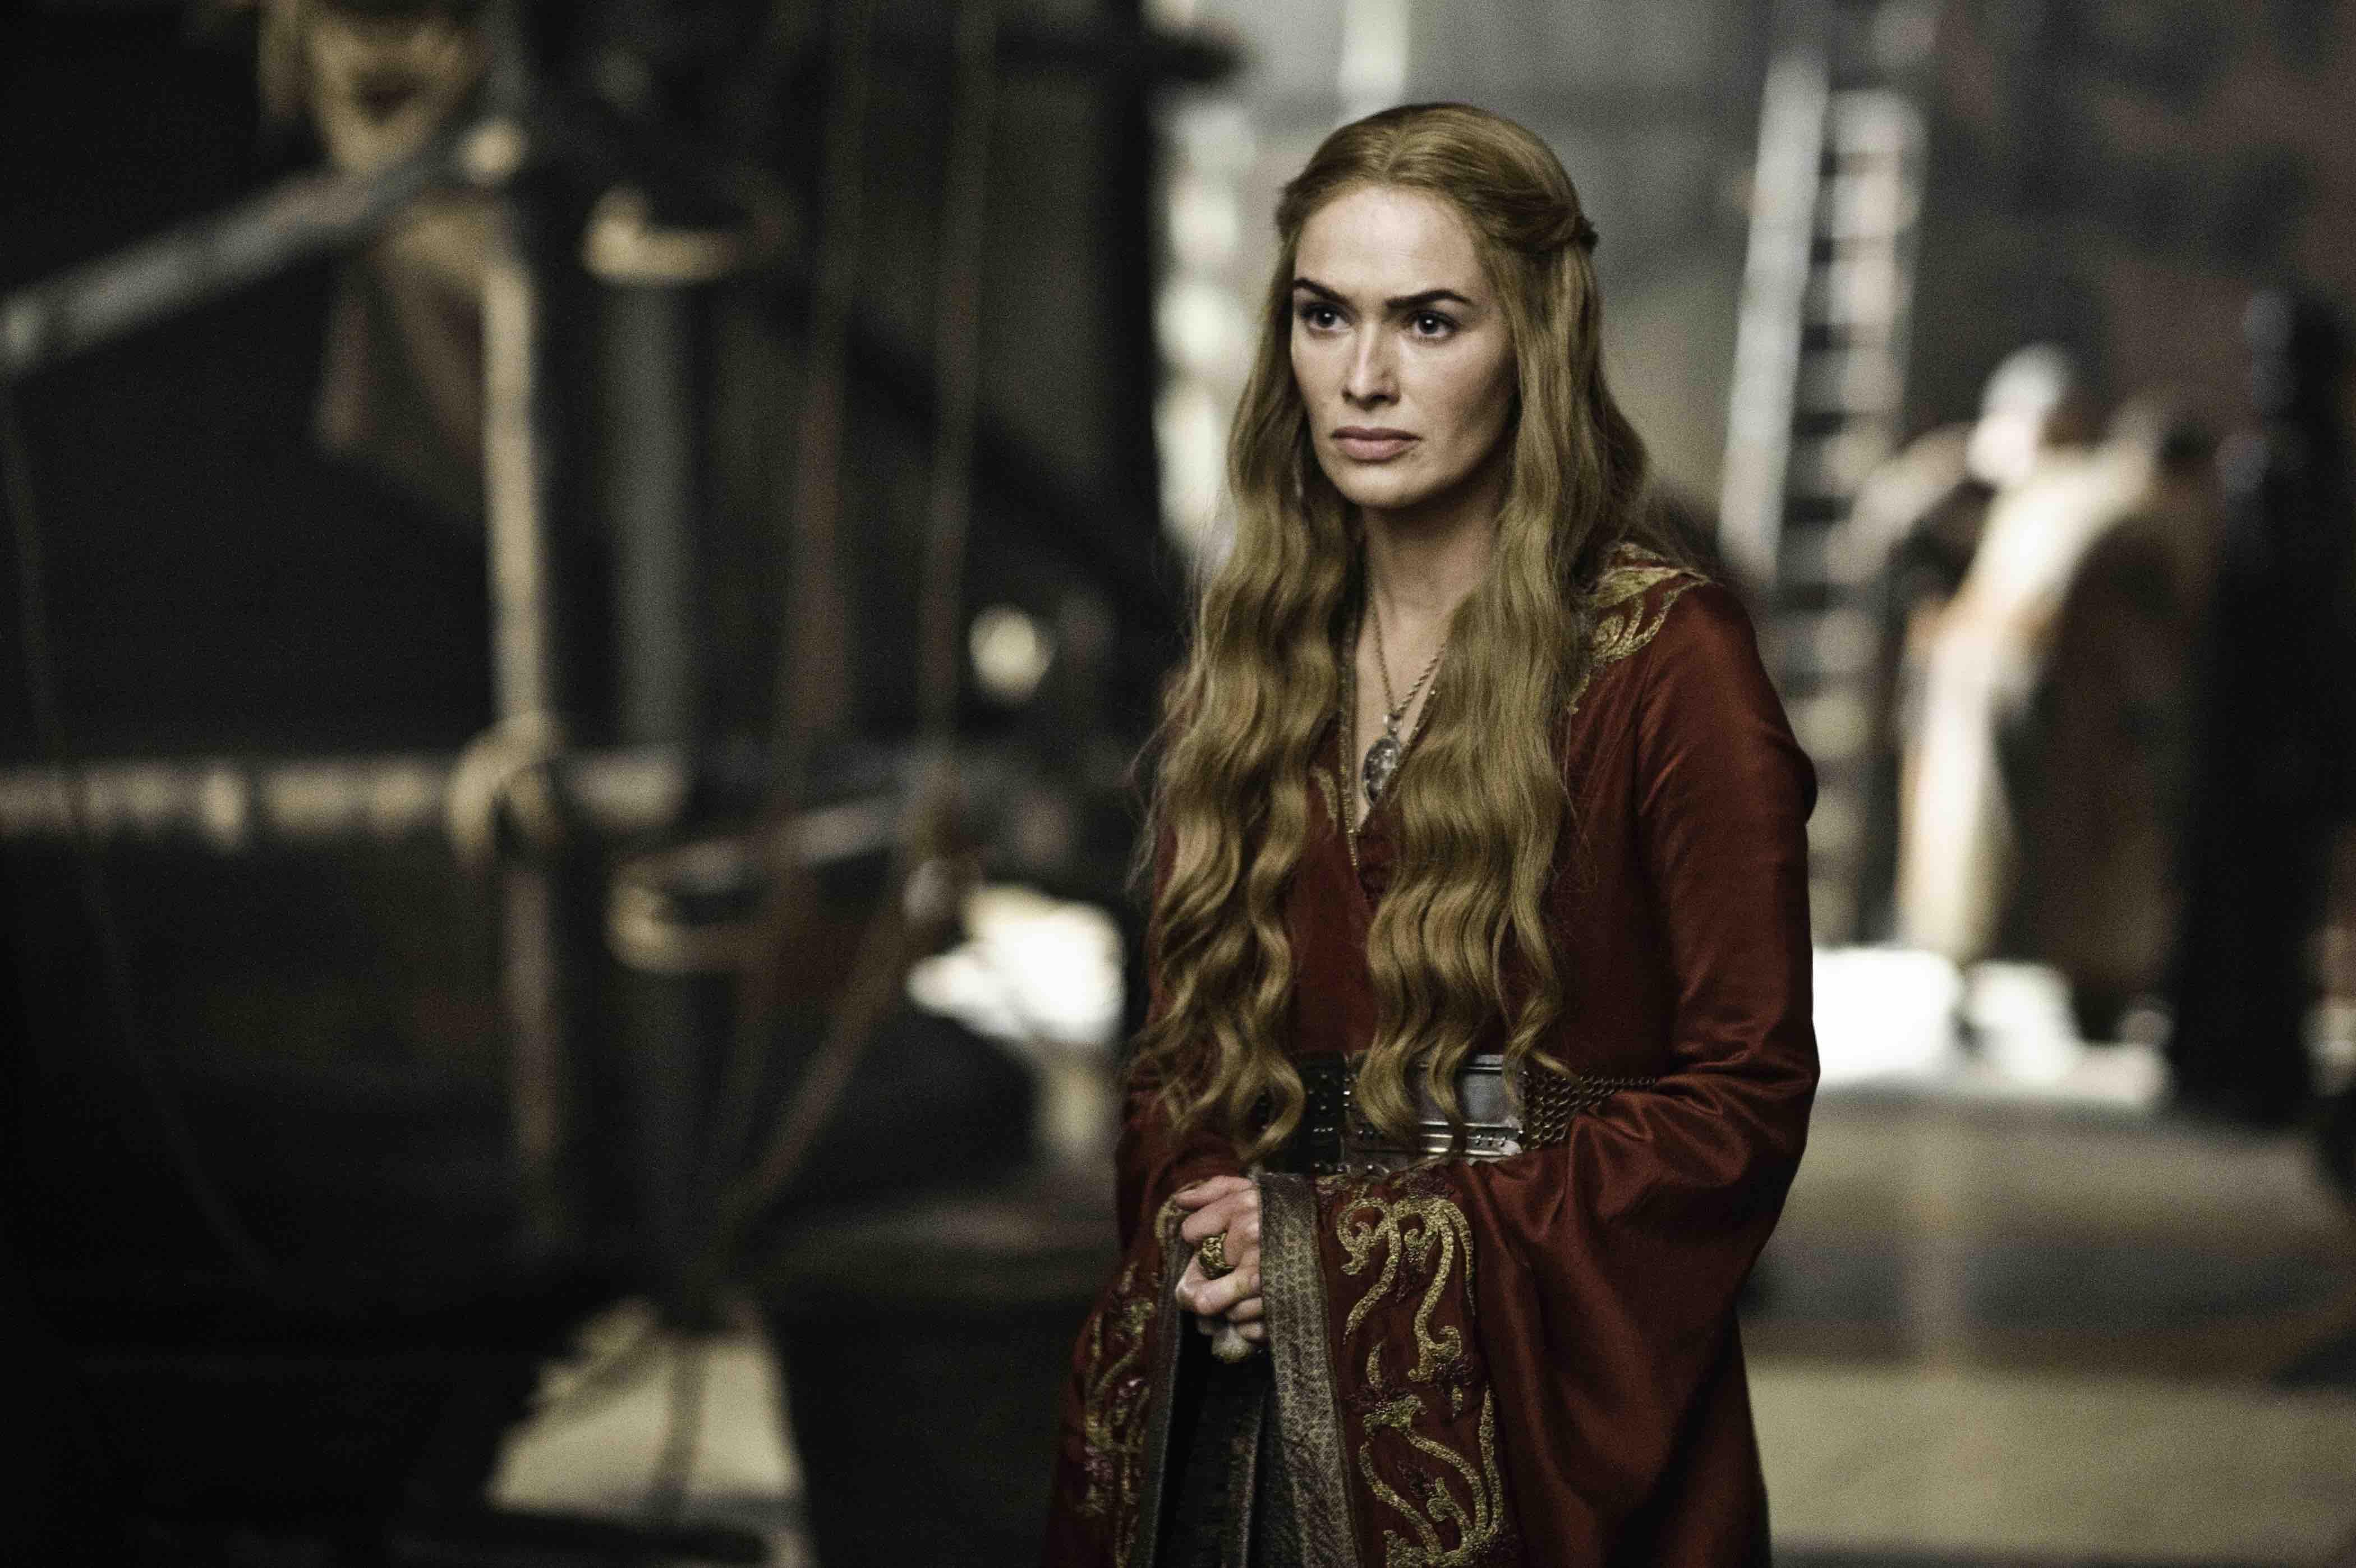 Lena-Headey-Cersei-Lannister-Game-Thrones